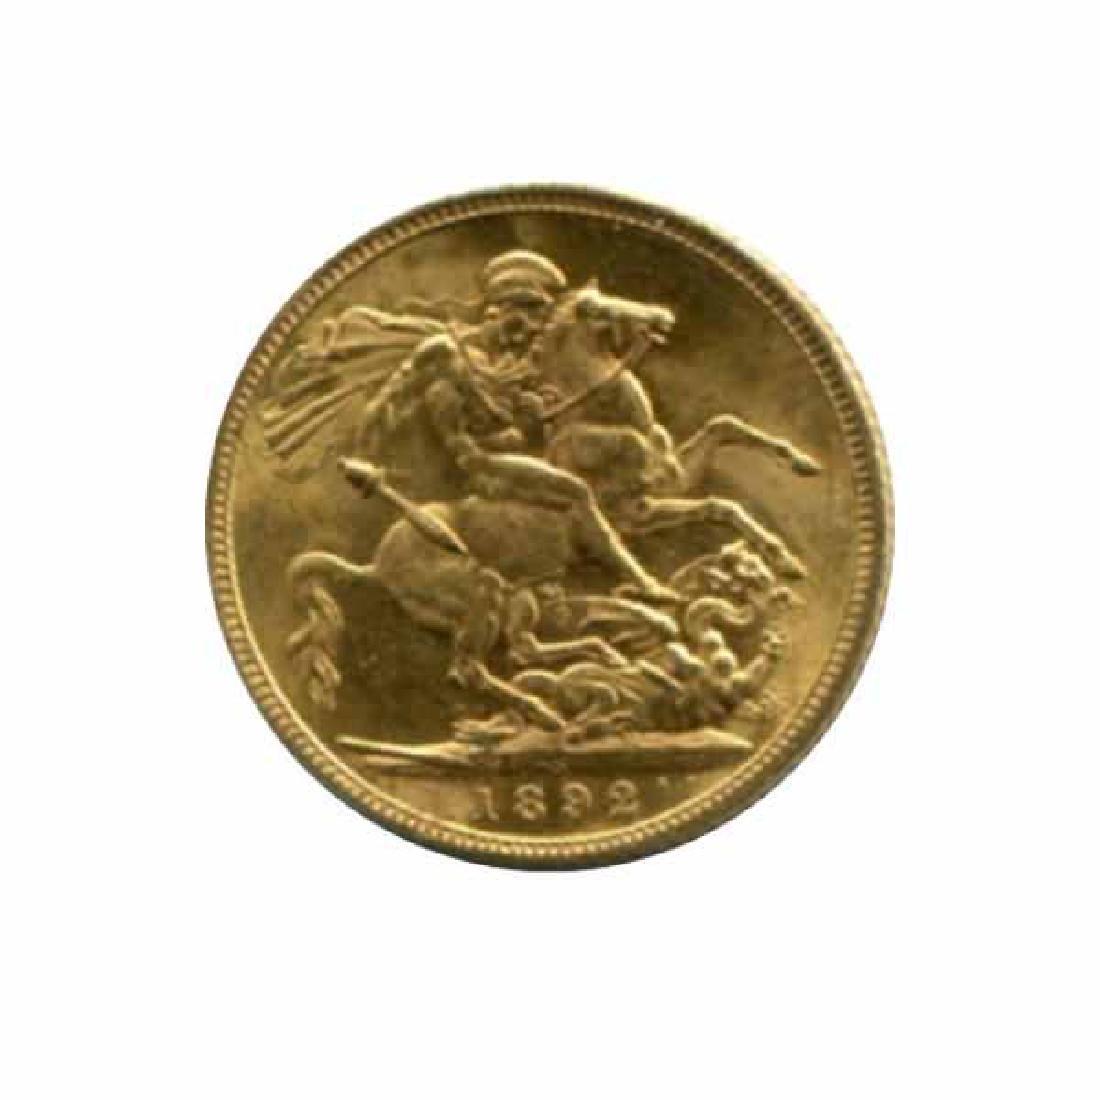 Australia Sydney Mint 1 sovereign gold 1892 AU+